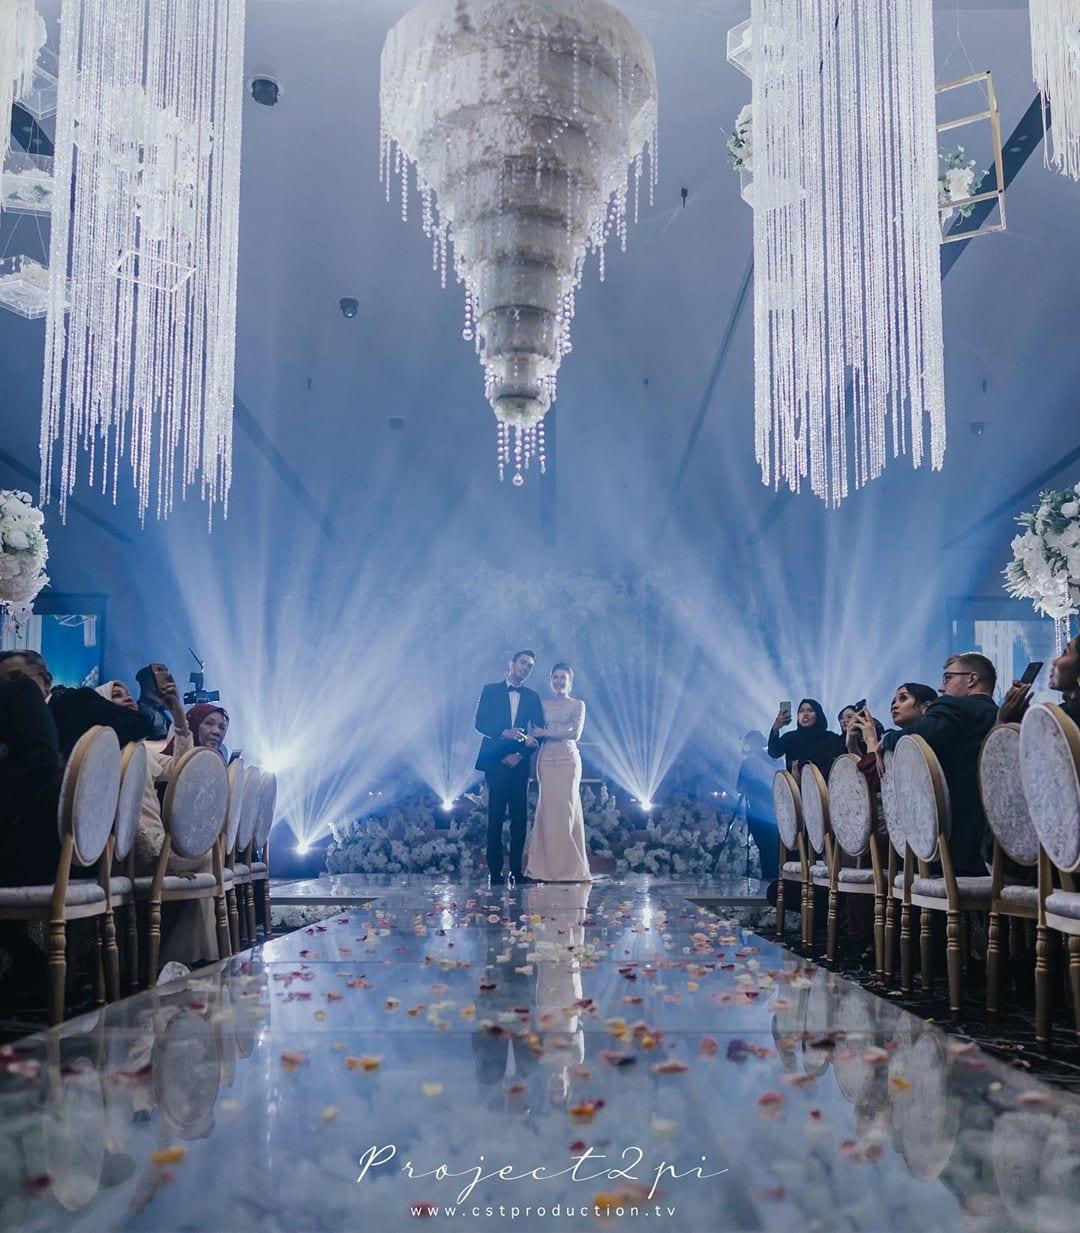 [VIDEO] Ramai Terkejut Kek Kahwin Zahirah & Aiman Terbalik, Bukan Biasa-Biasa